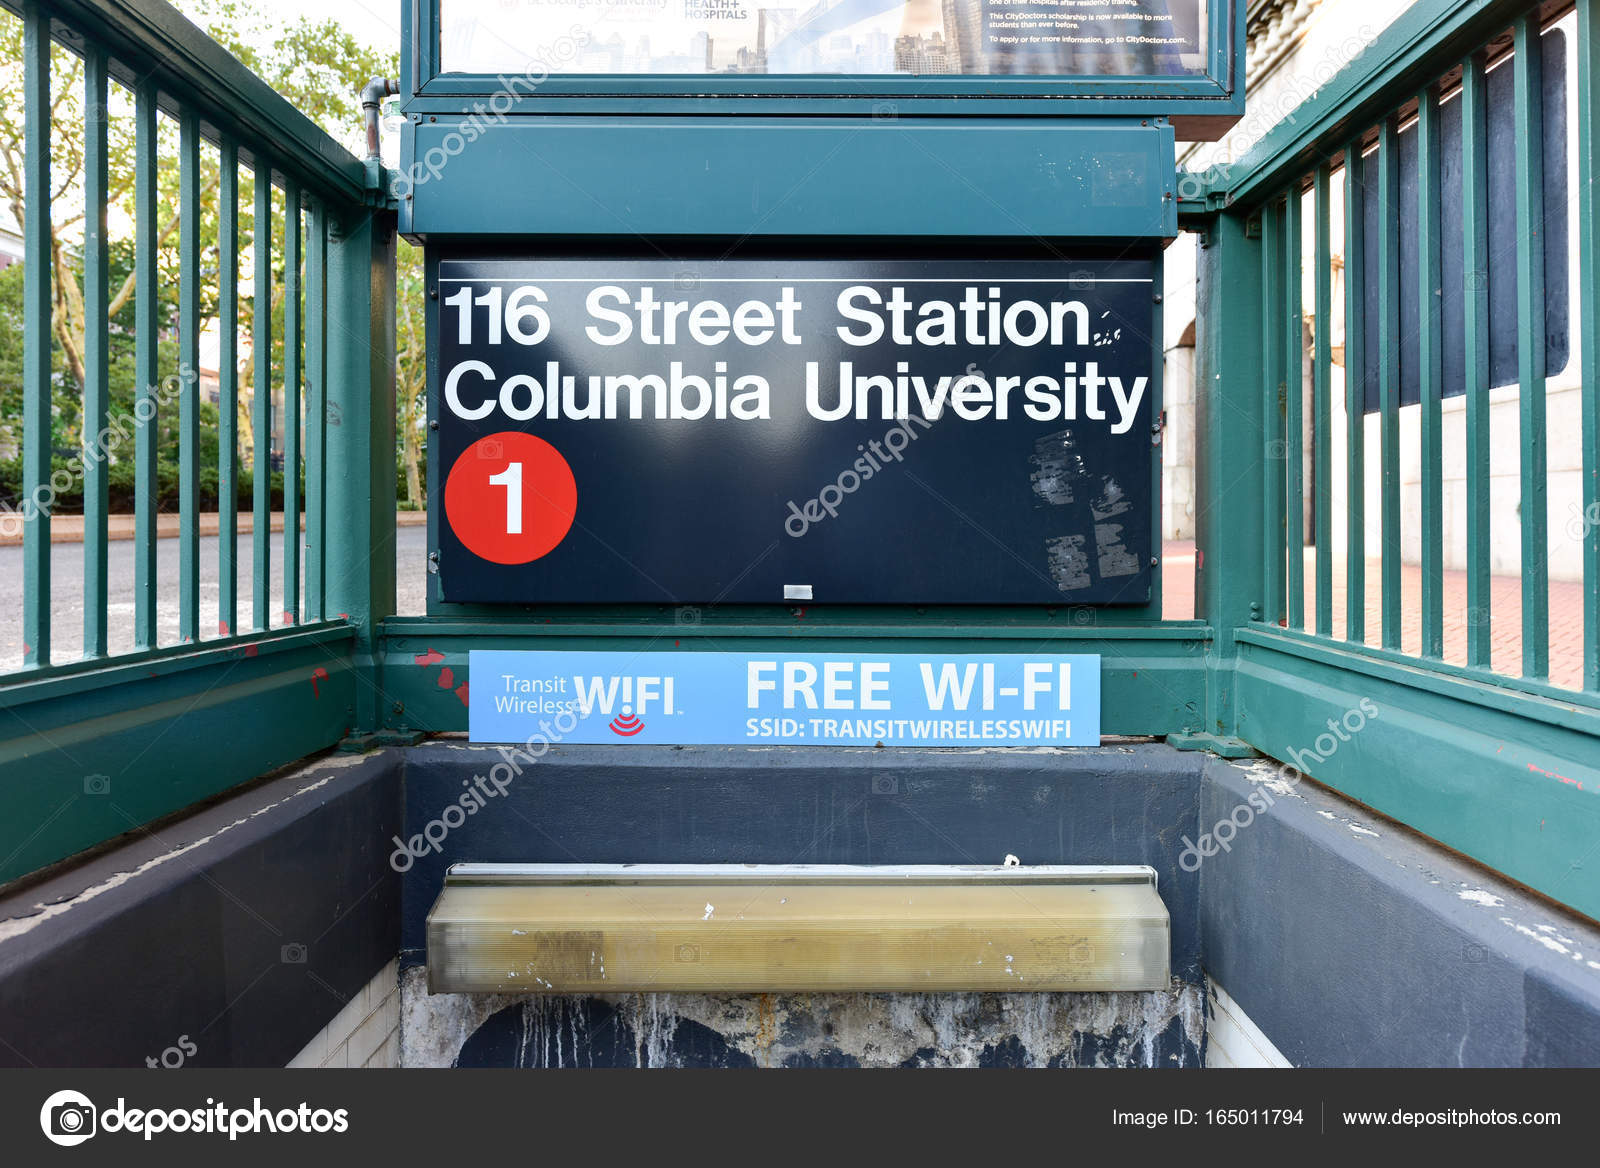 116 丁目地下鉄駅 - ニューヨー...